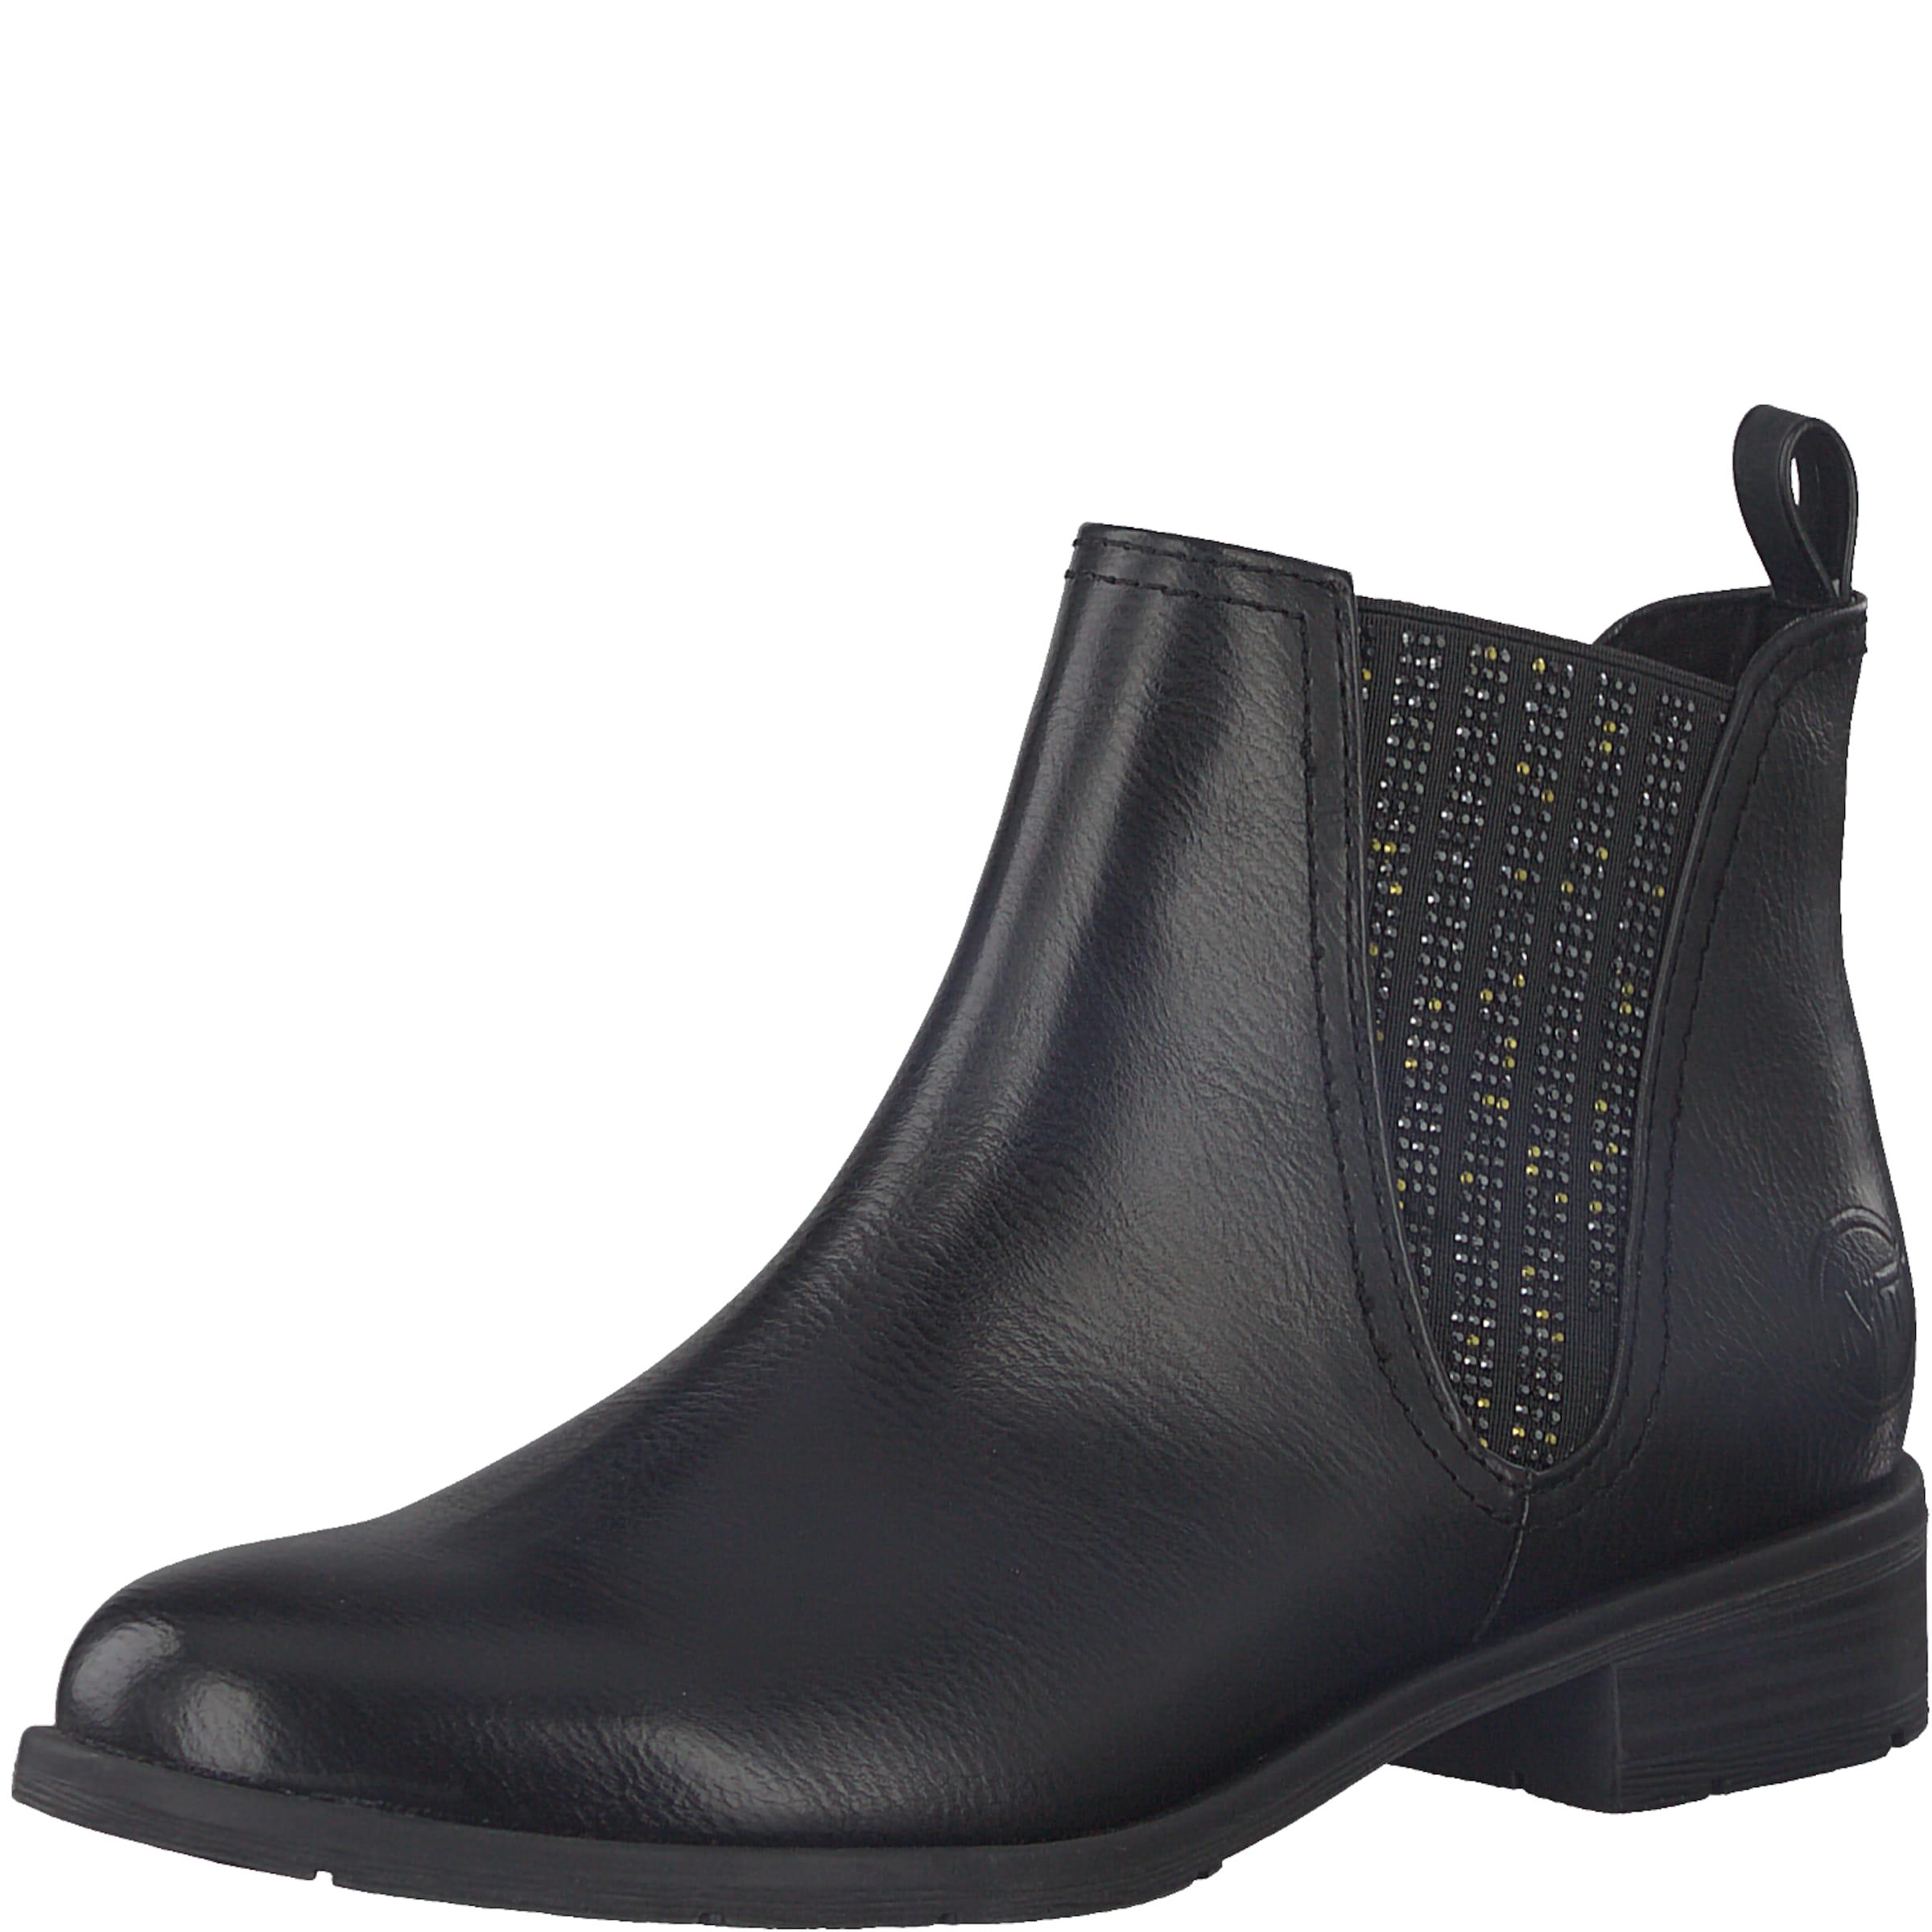 MARCO TOZZI Chelsea-Stiefelette Verschleißfeste billige Schuhe